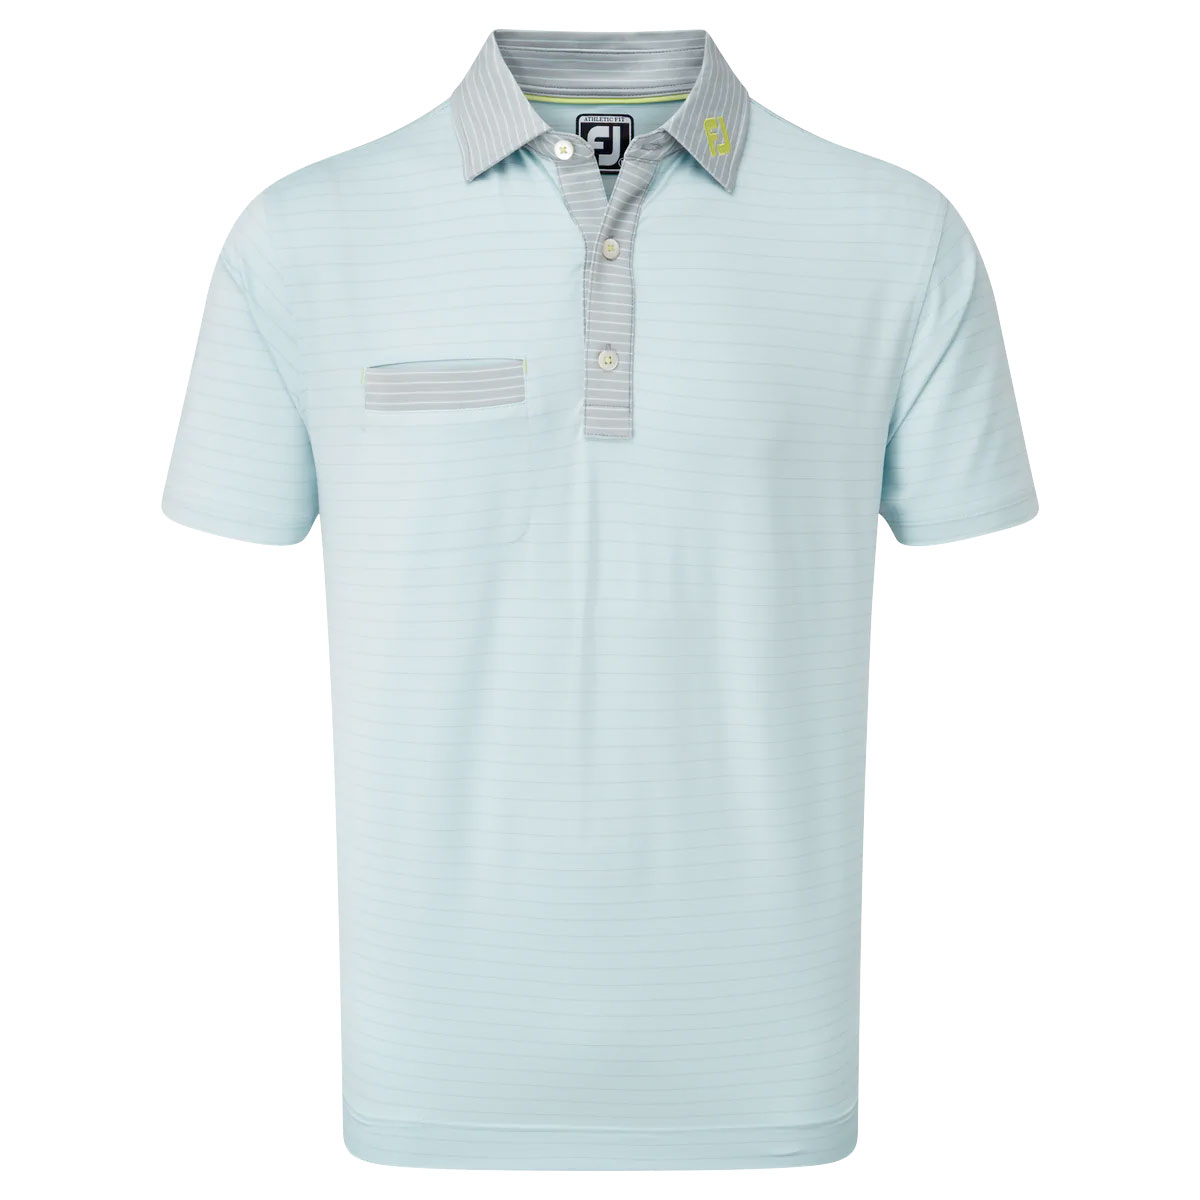 FootJoy Lisle Pinstripe Mix Mens Golf Polo Shirt  - Ice Blue